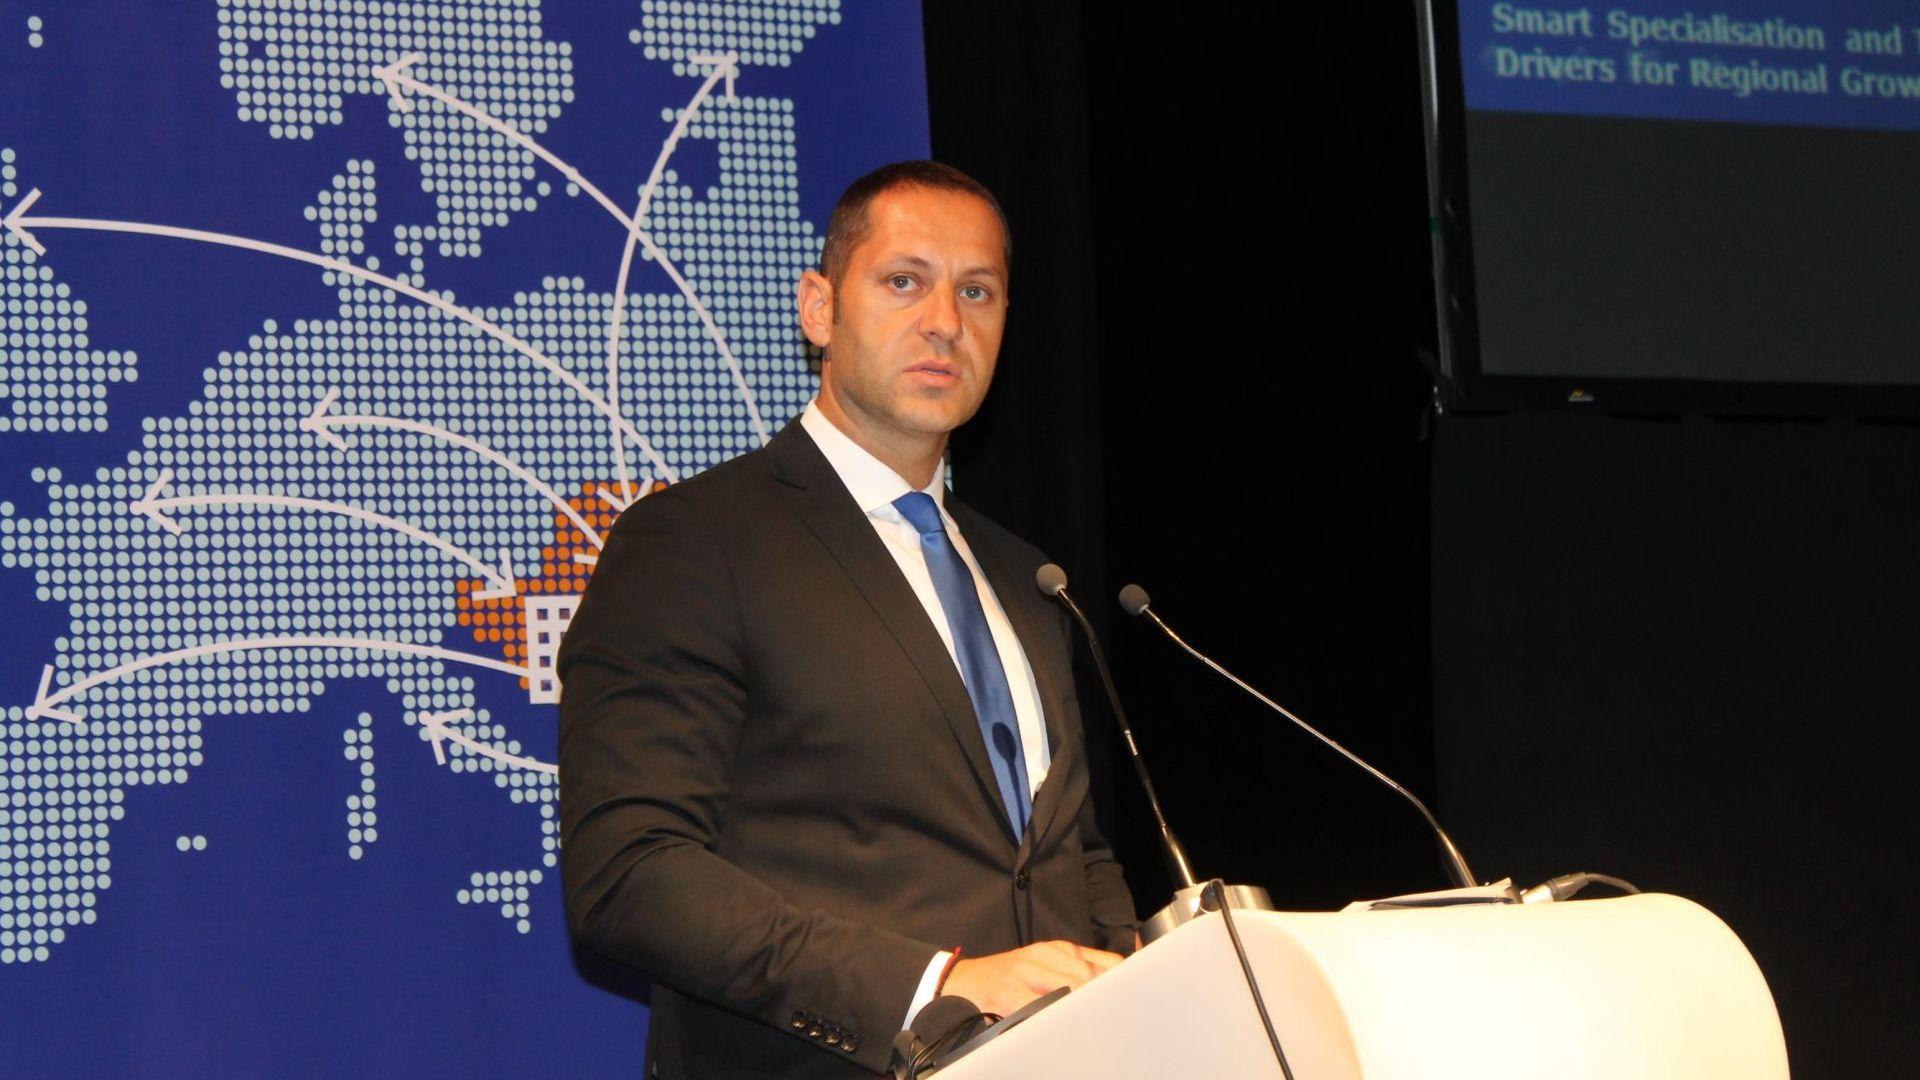 650 млн. лв. инвестиции за конкурентоспособност